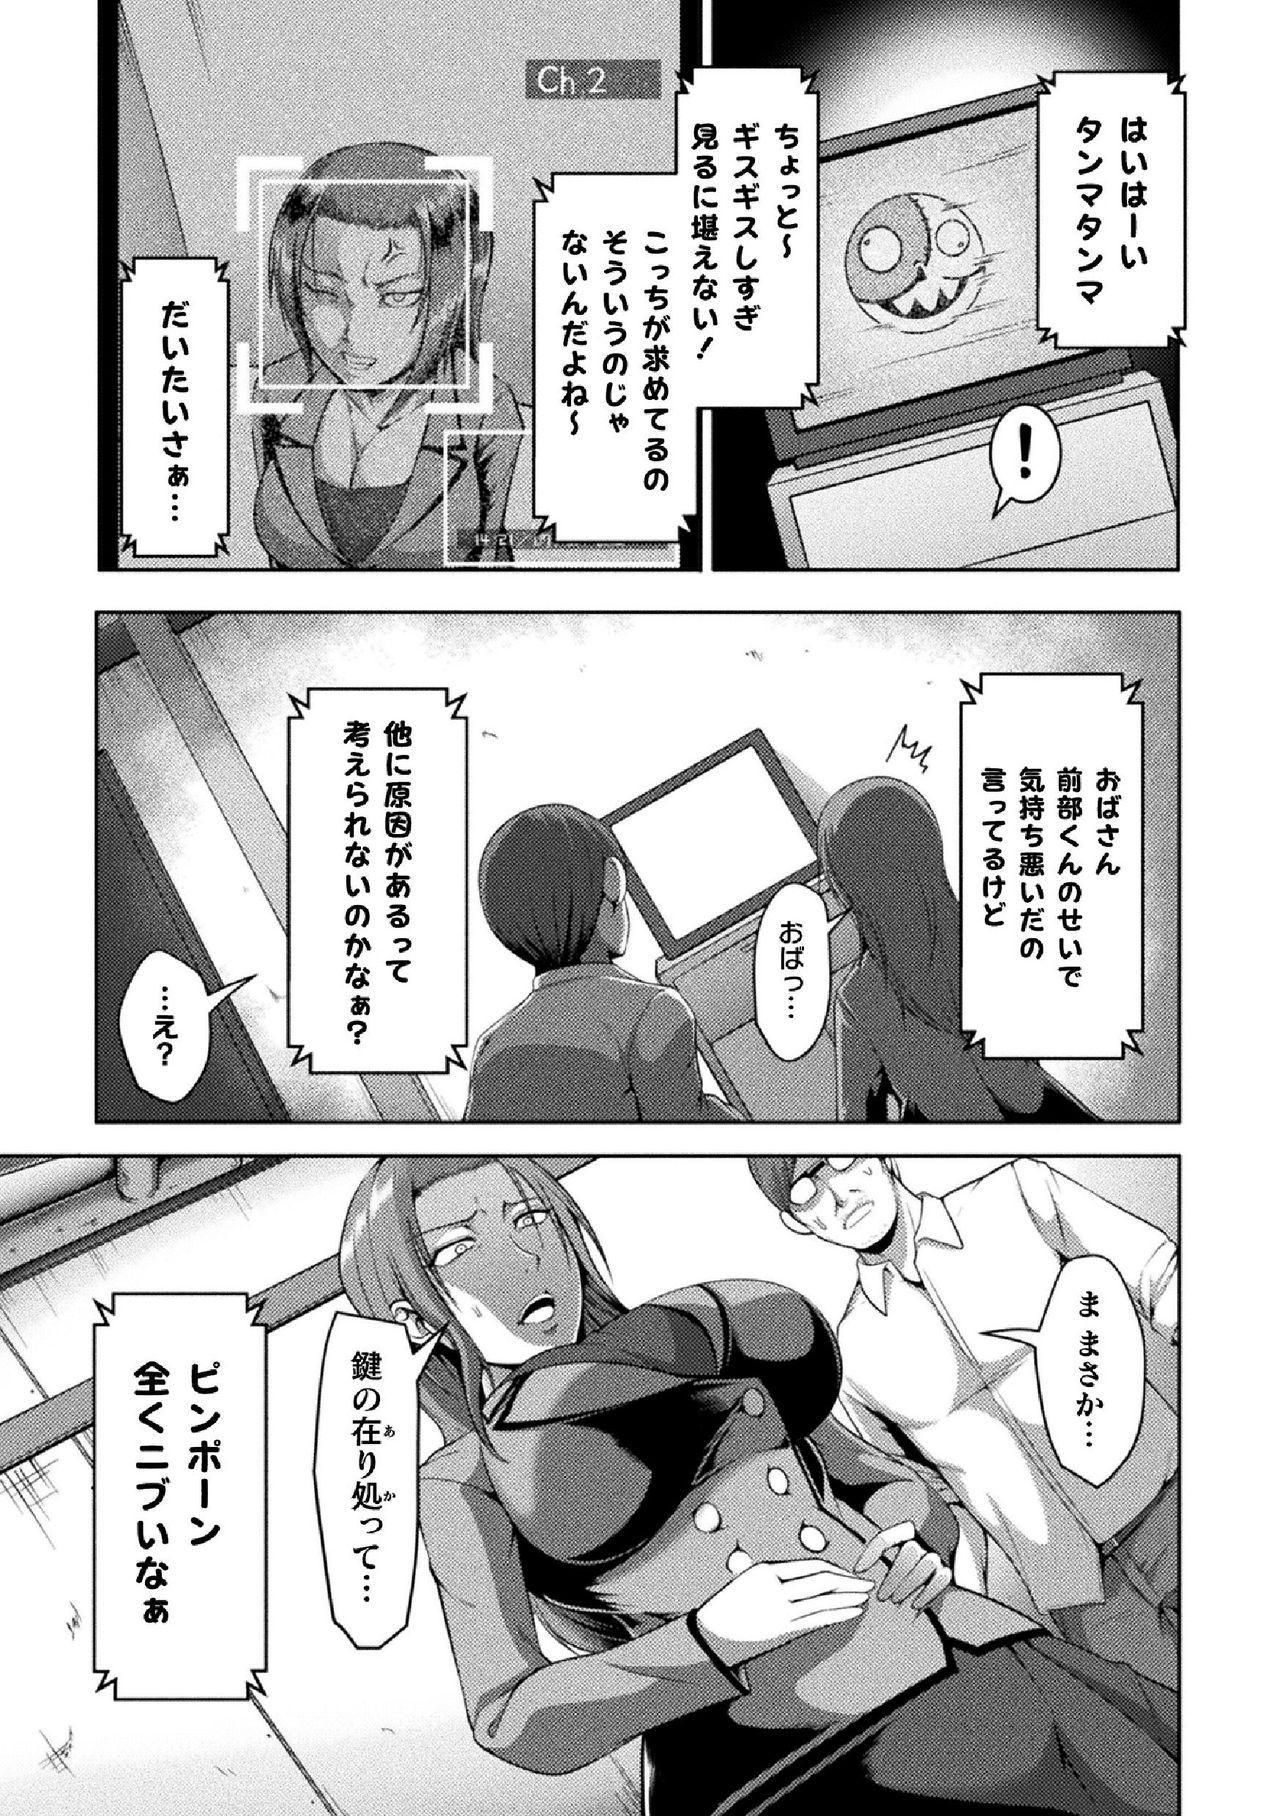 2D Comic Magazine Namaiki Onna ni HaraPun Seisai! Vol. 2 52